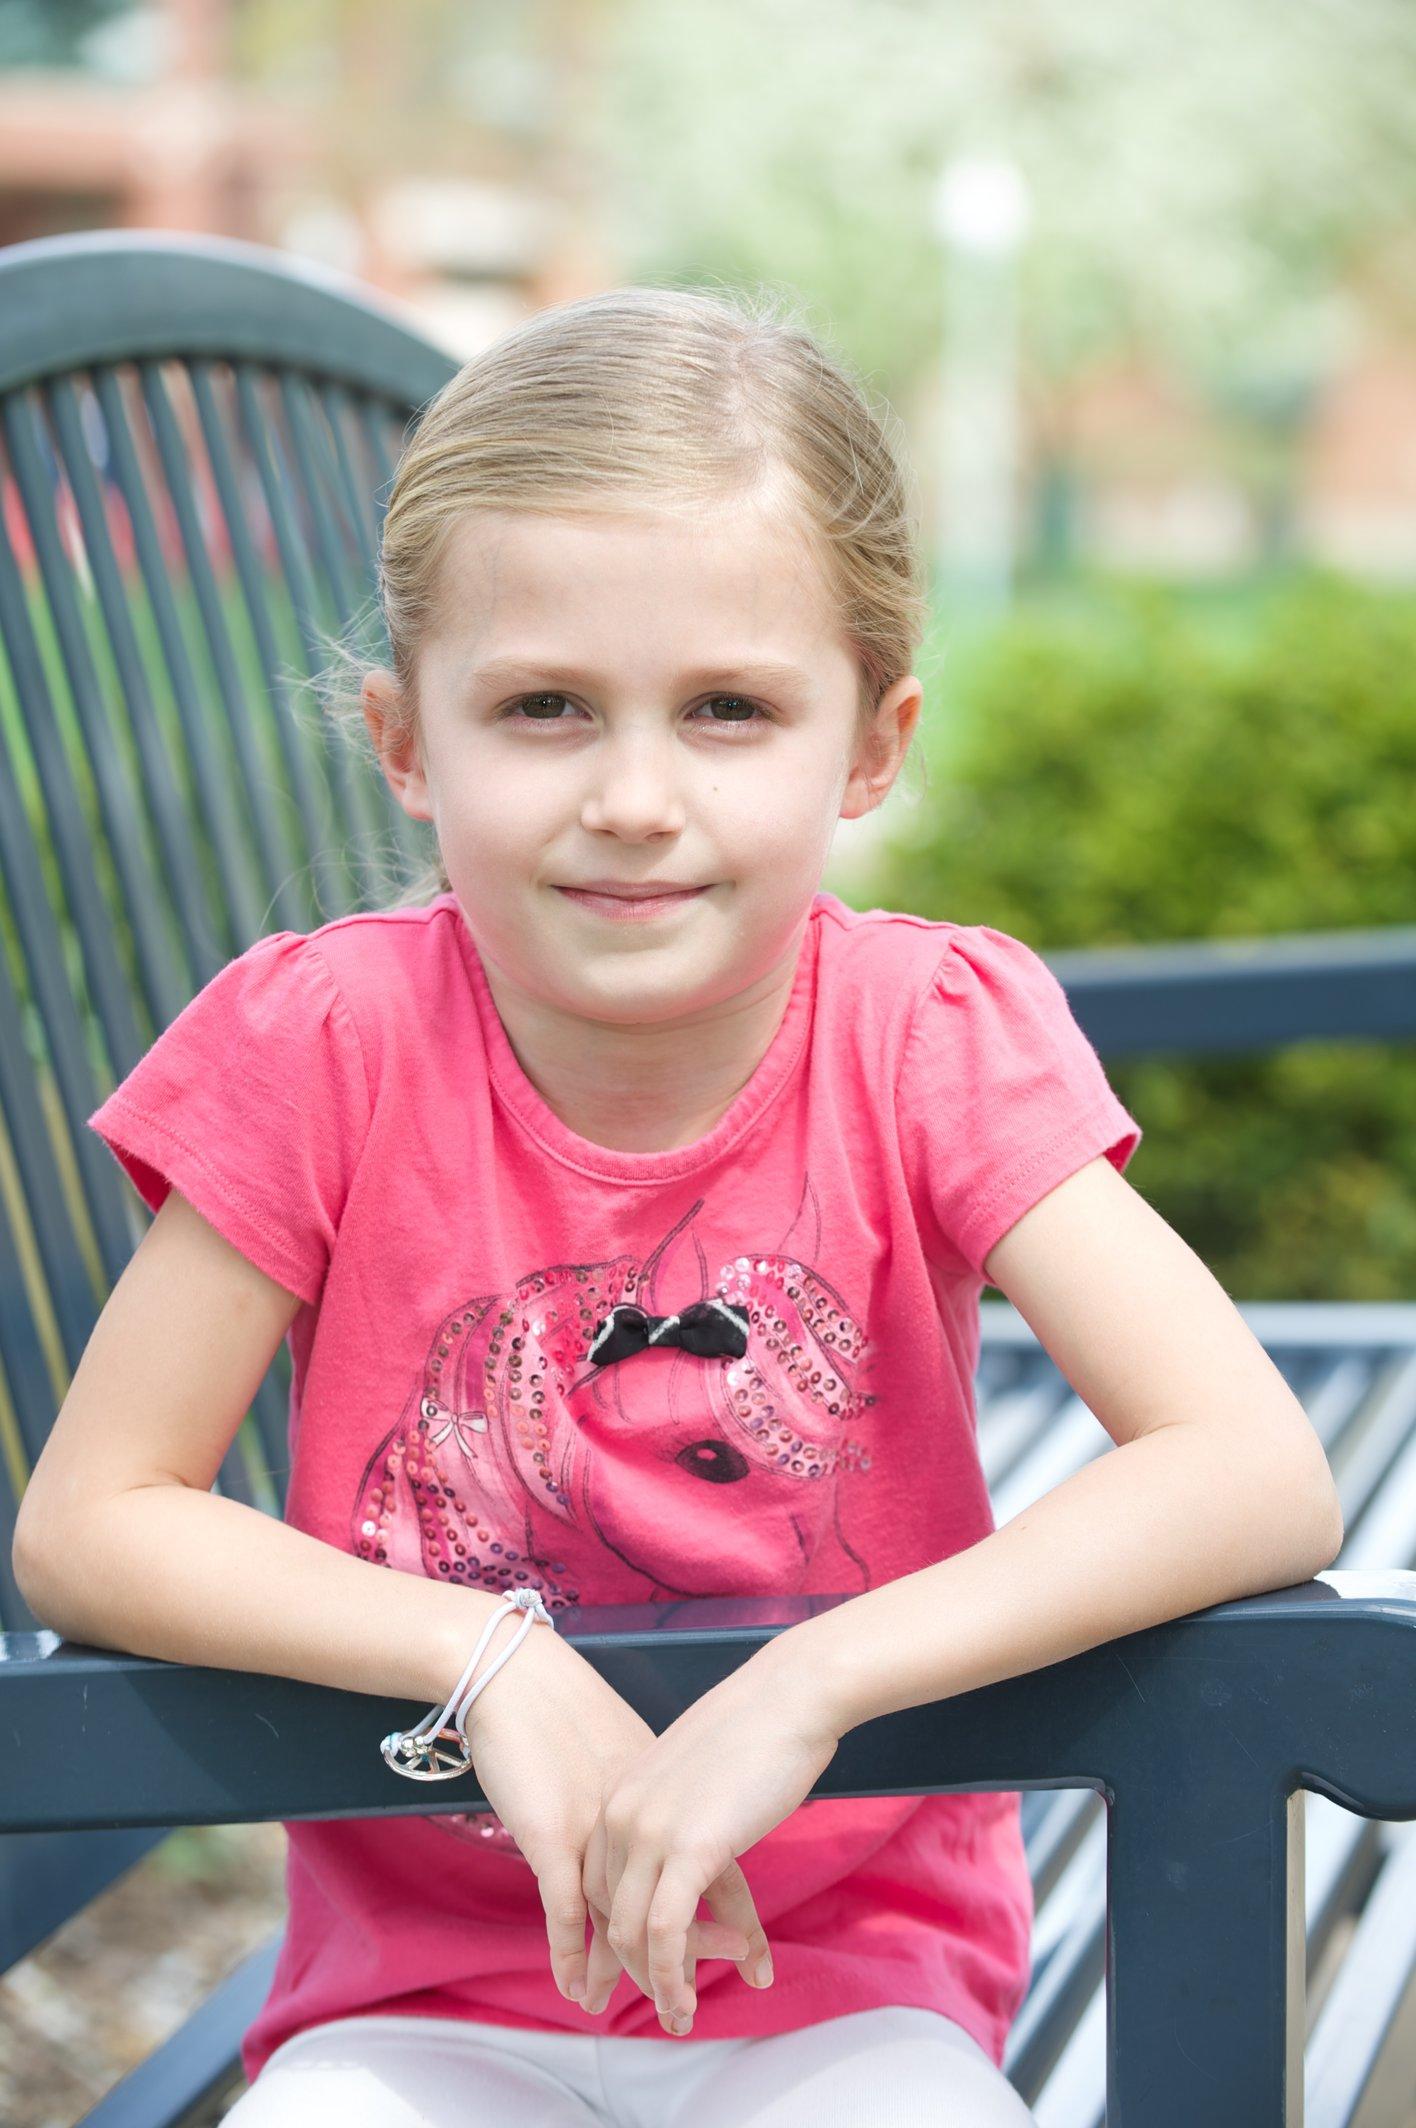 rsz_akron_childrens_hospital_domers_peyton_photo.jpg